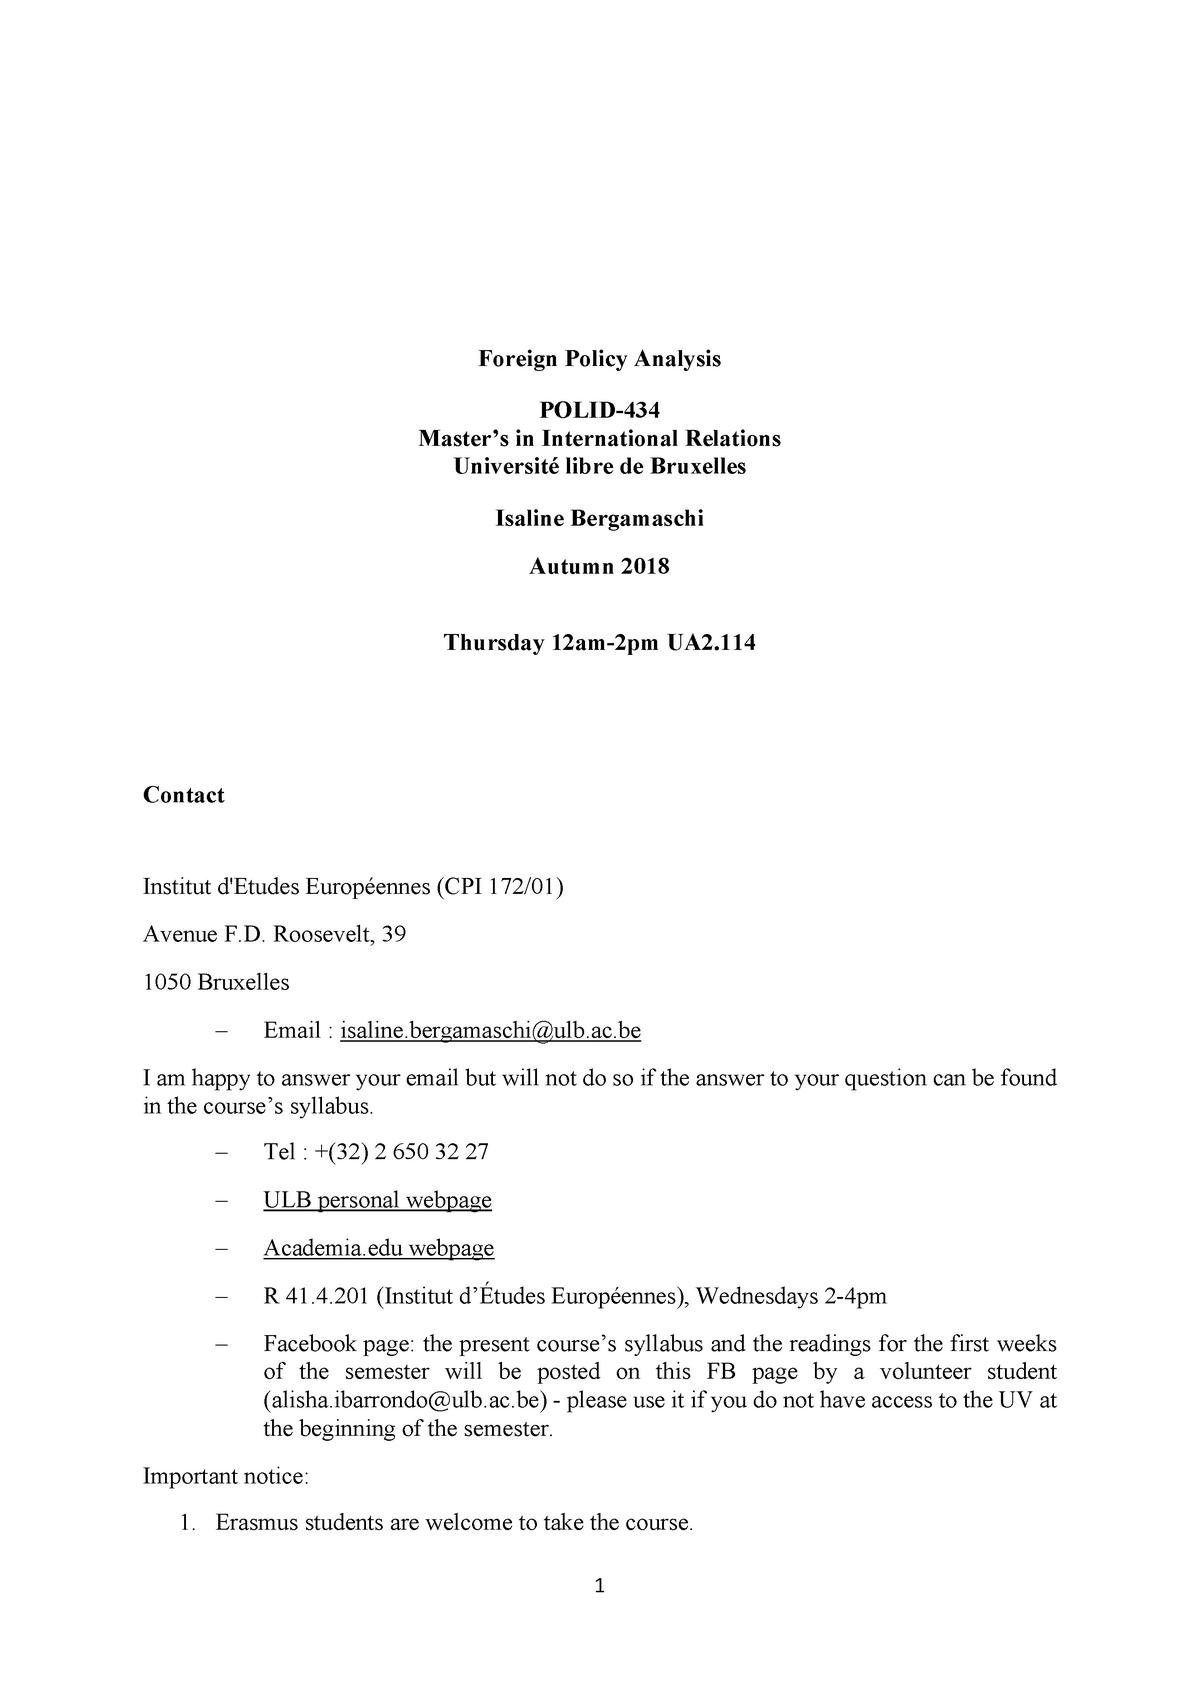 Bergamaschi FPA Syllabus 2018-9 PDF - POLI-D434 - ULB - StuDocu on